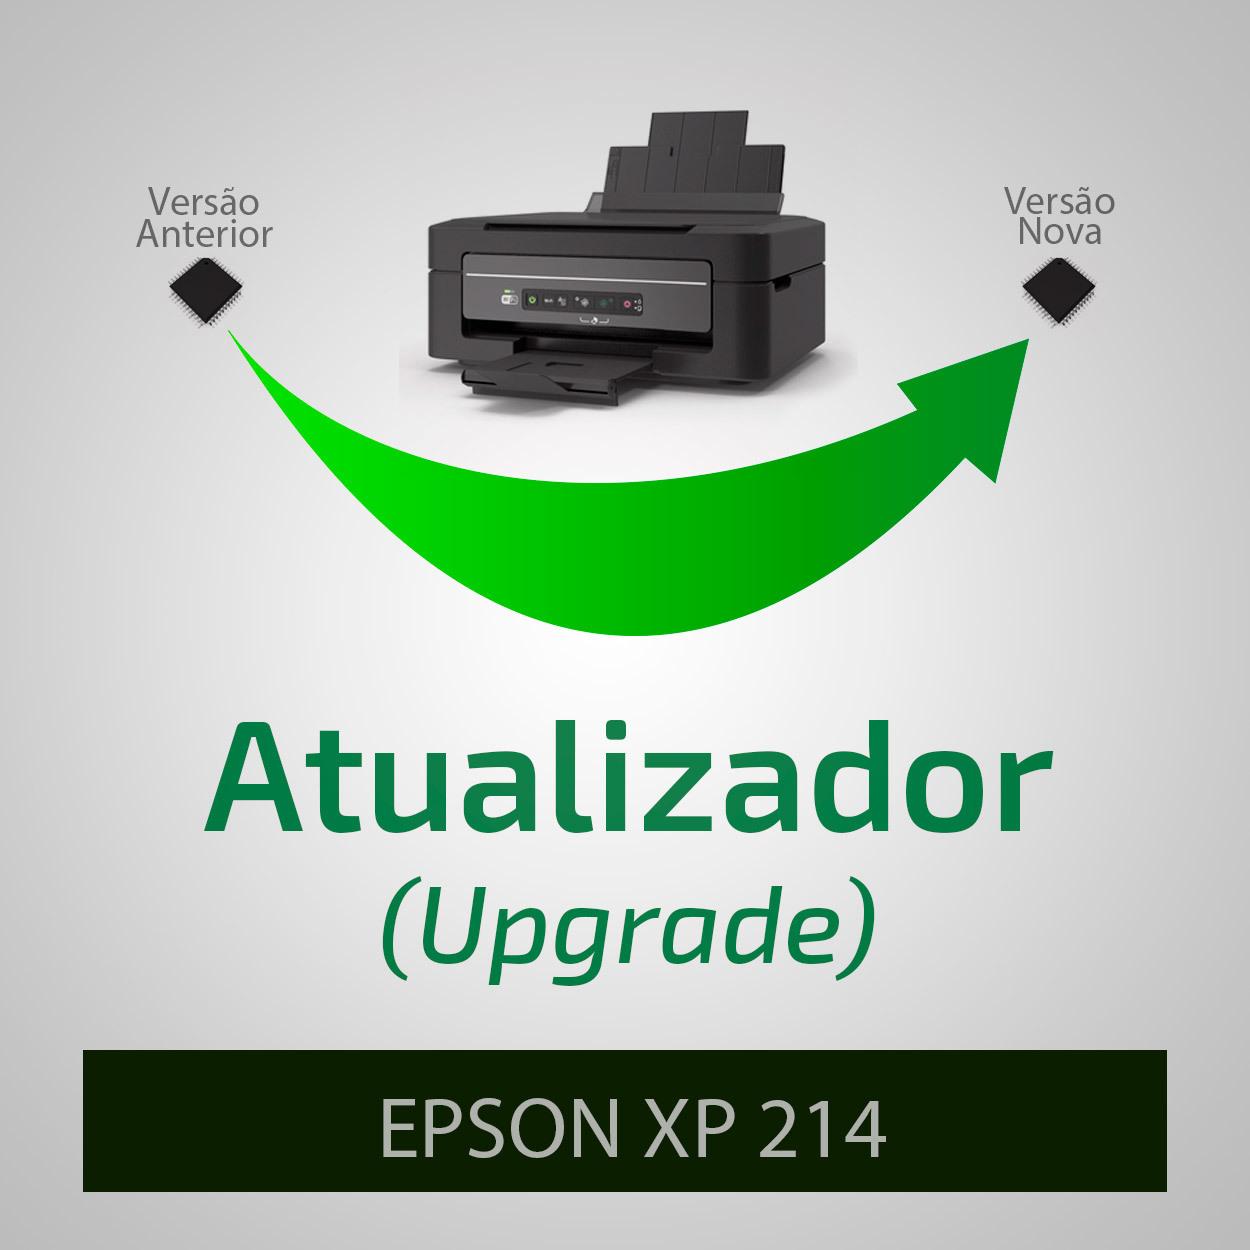 Epson XP-211, XP-212, XP-213, XP-214, XP-216 e PX-046A | Software Recovery Firmware (Windows)